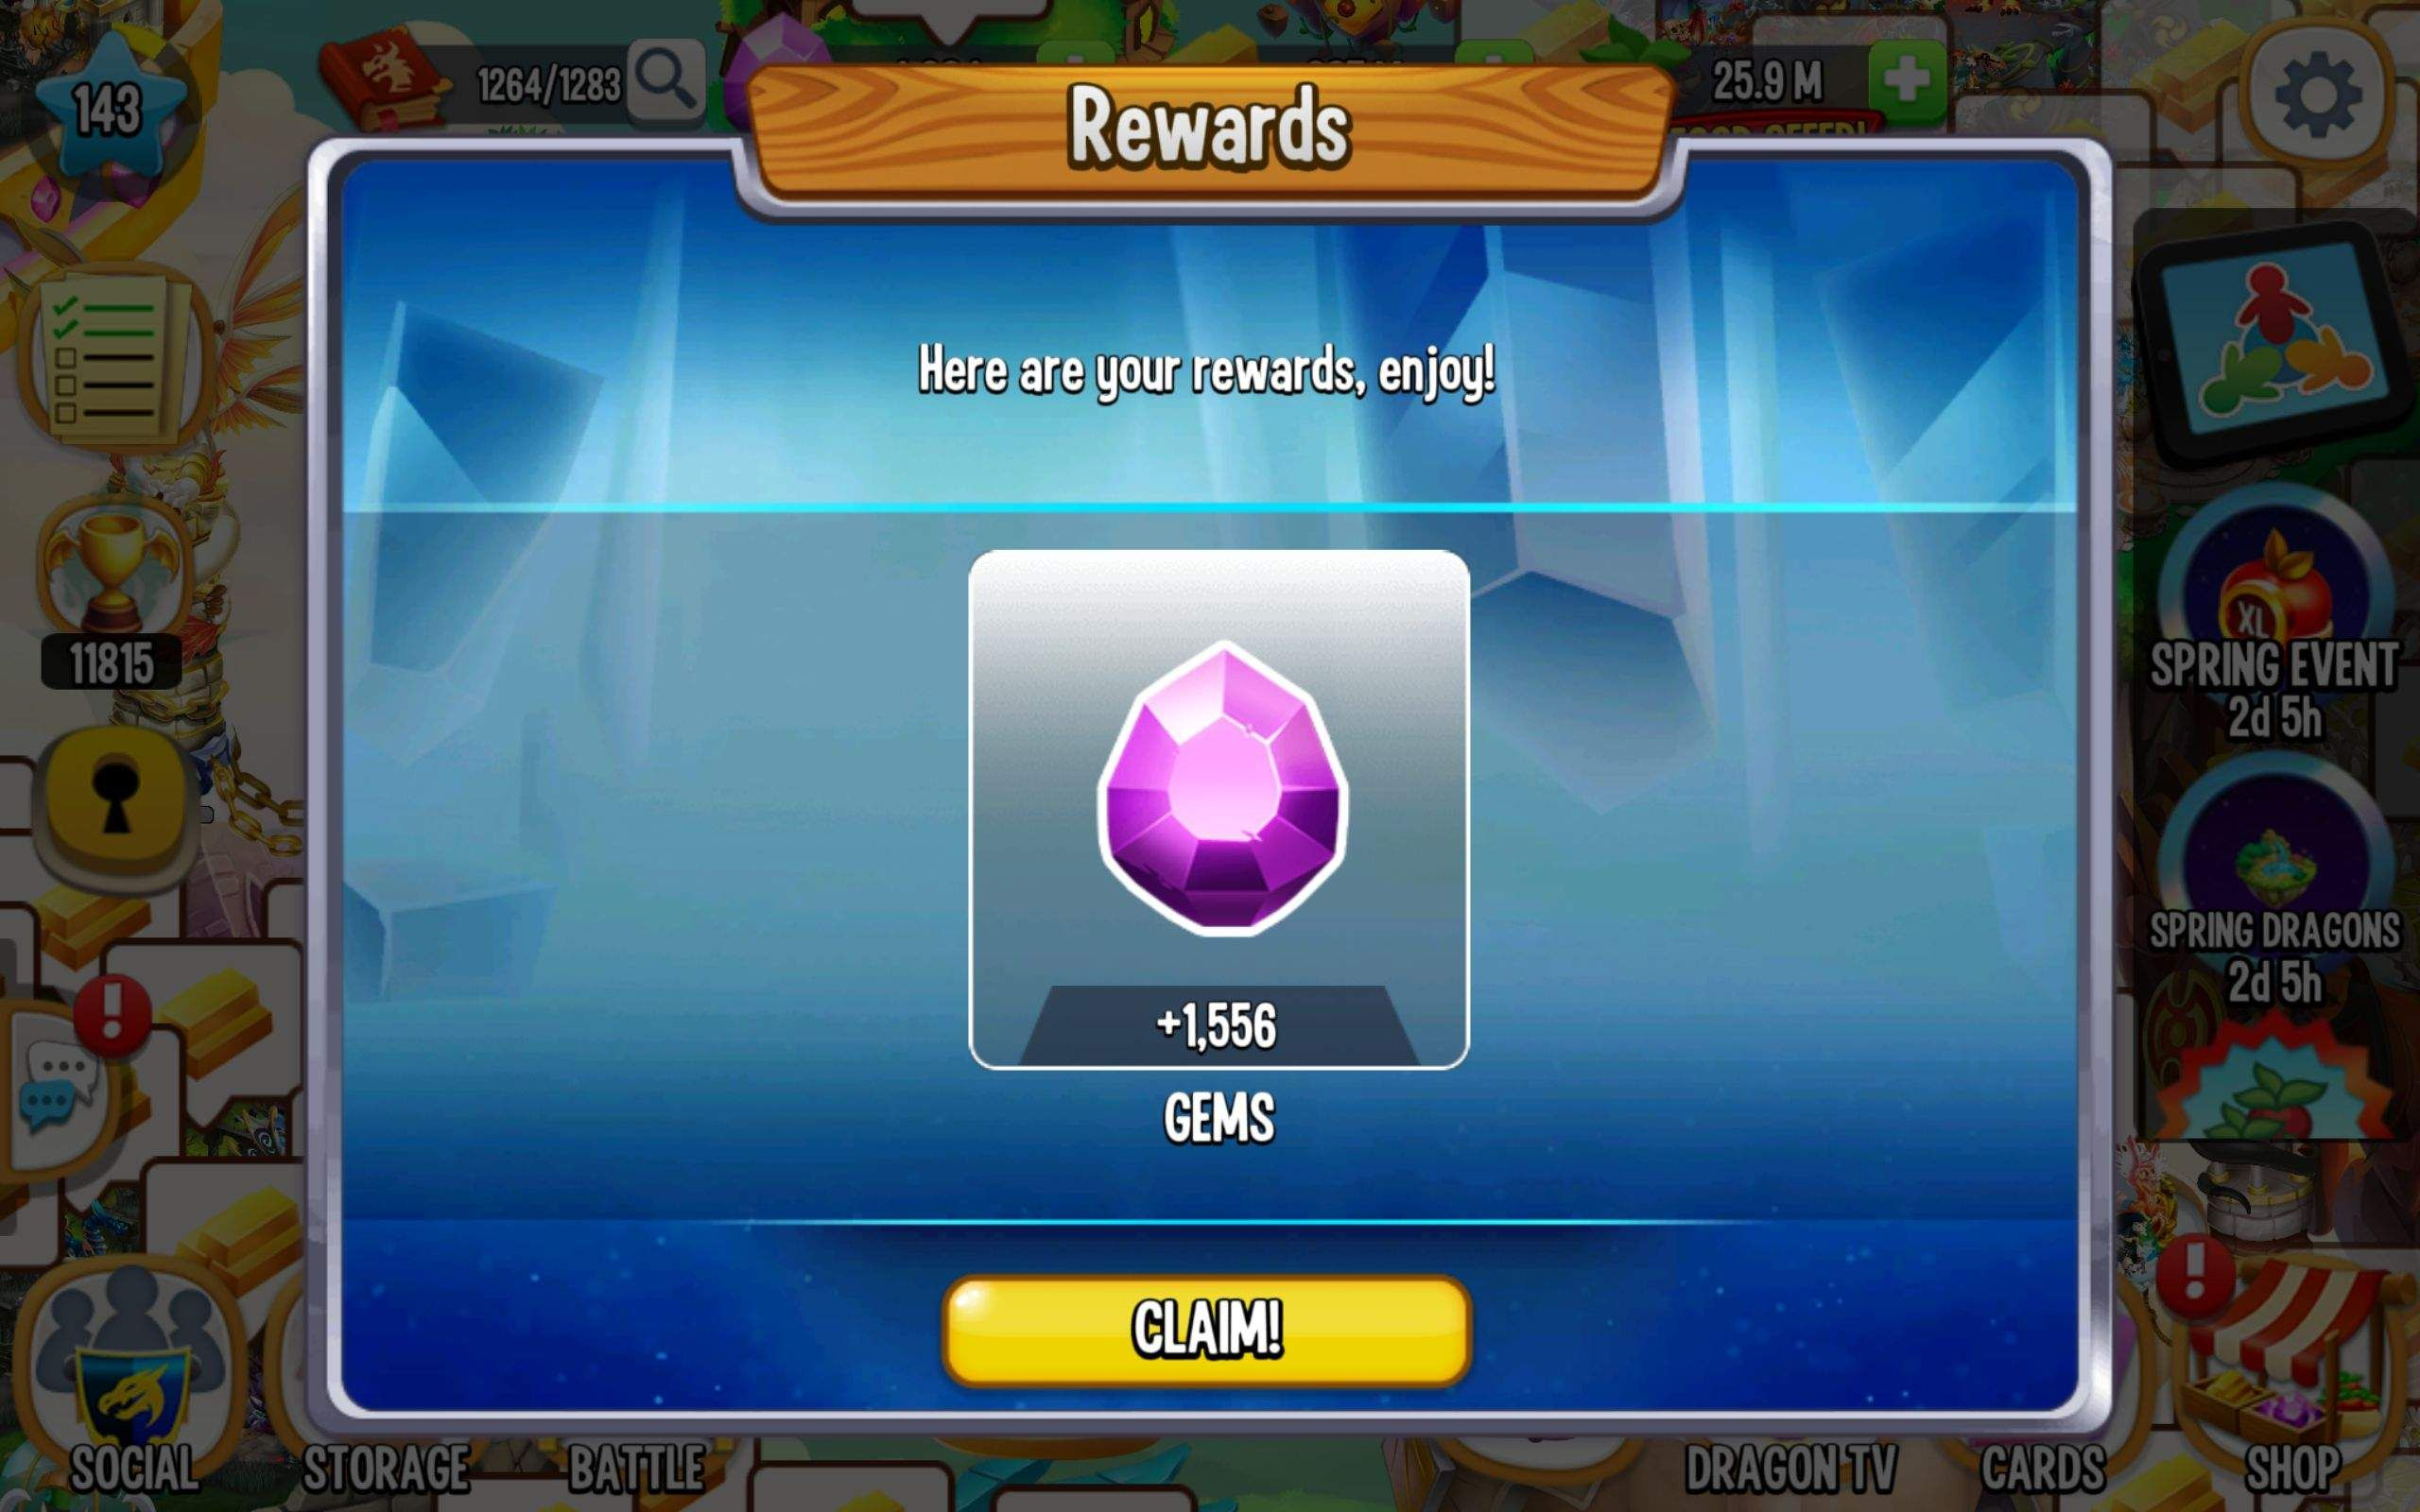 0_1585591652784_032820 raid paid 1556g.jpeg